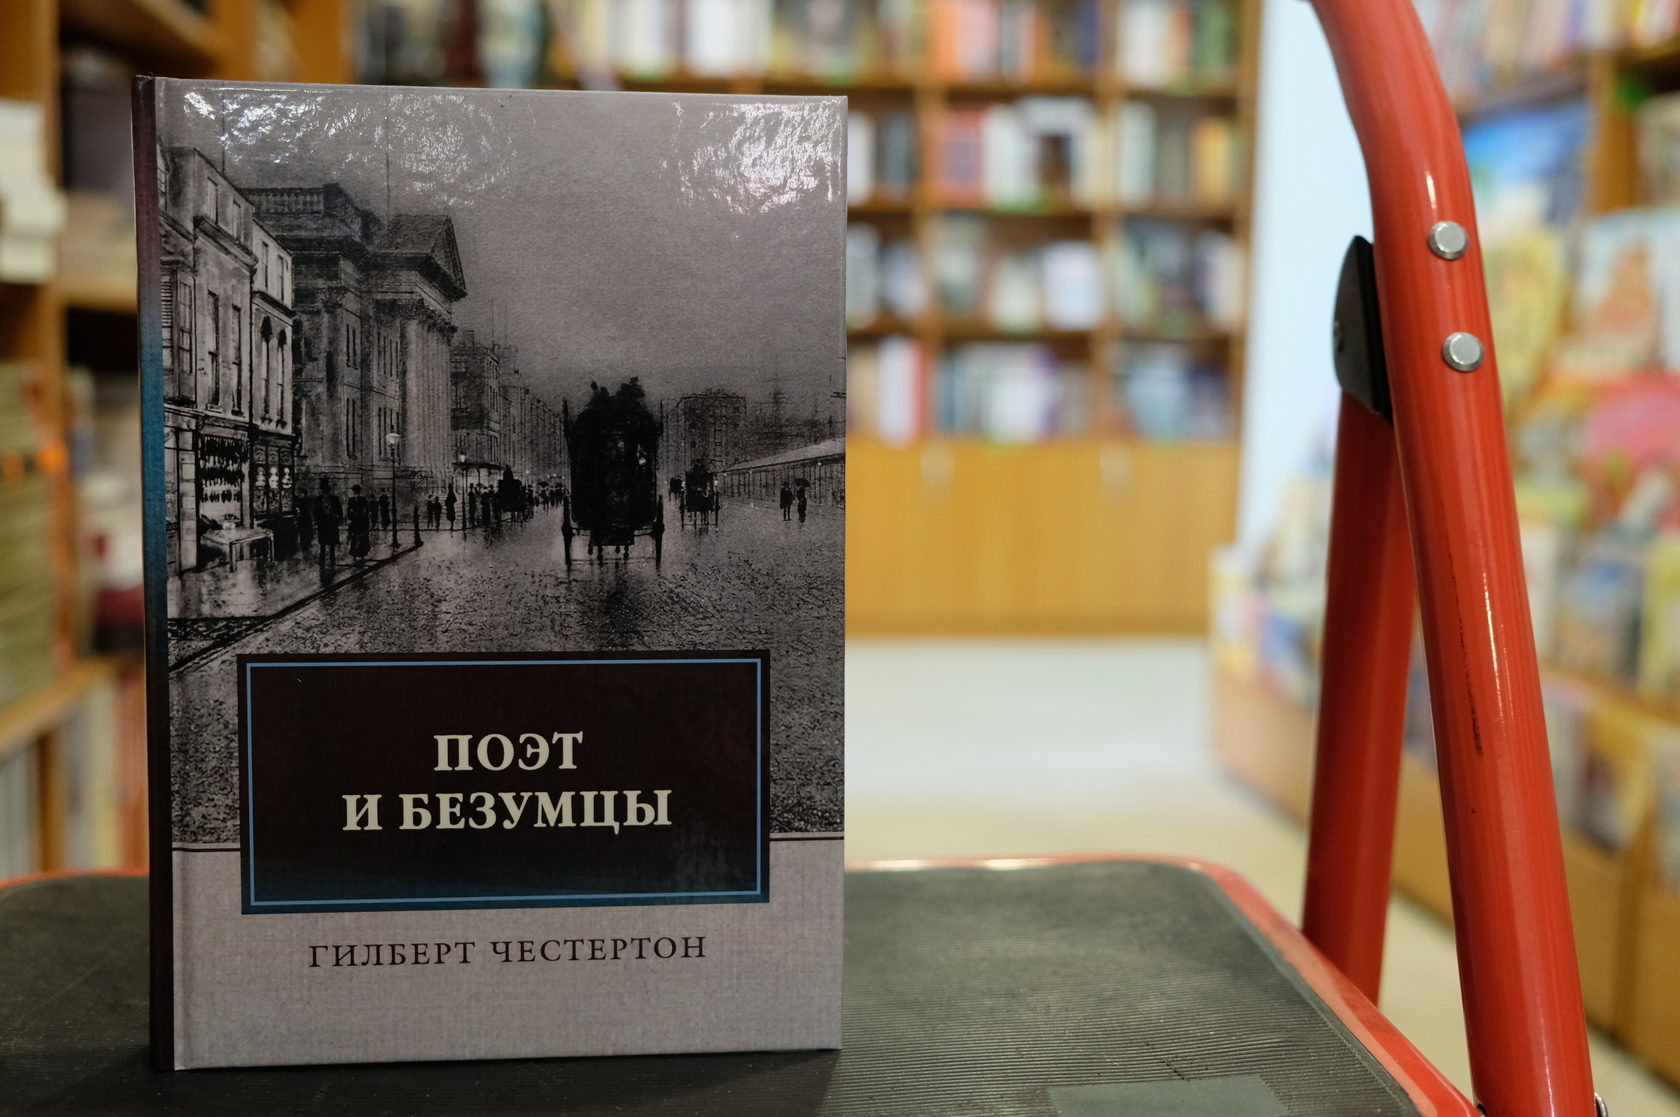 Гилберт Честертон «Поэт и безумцы»